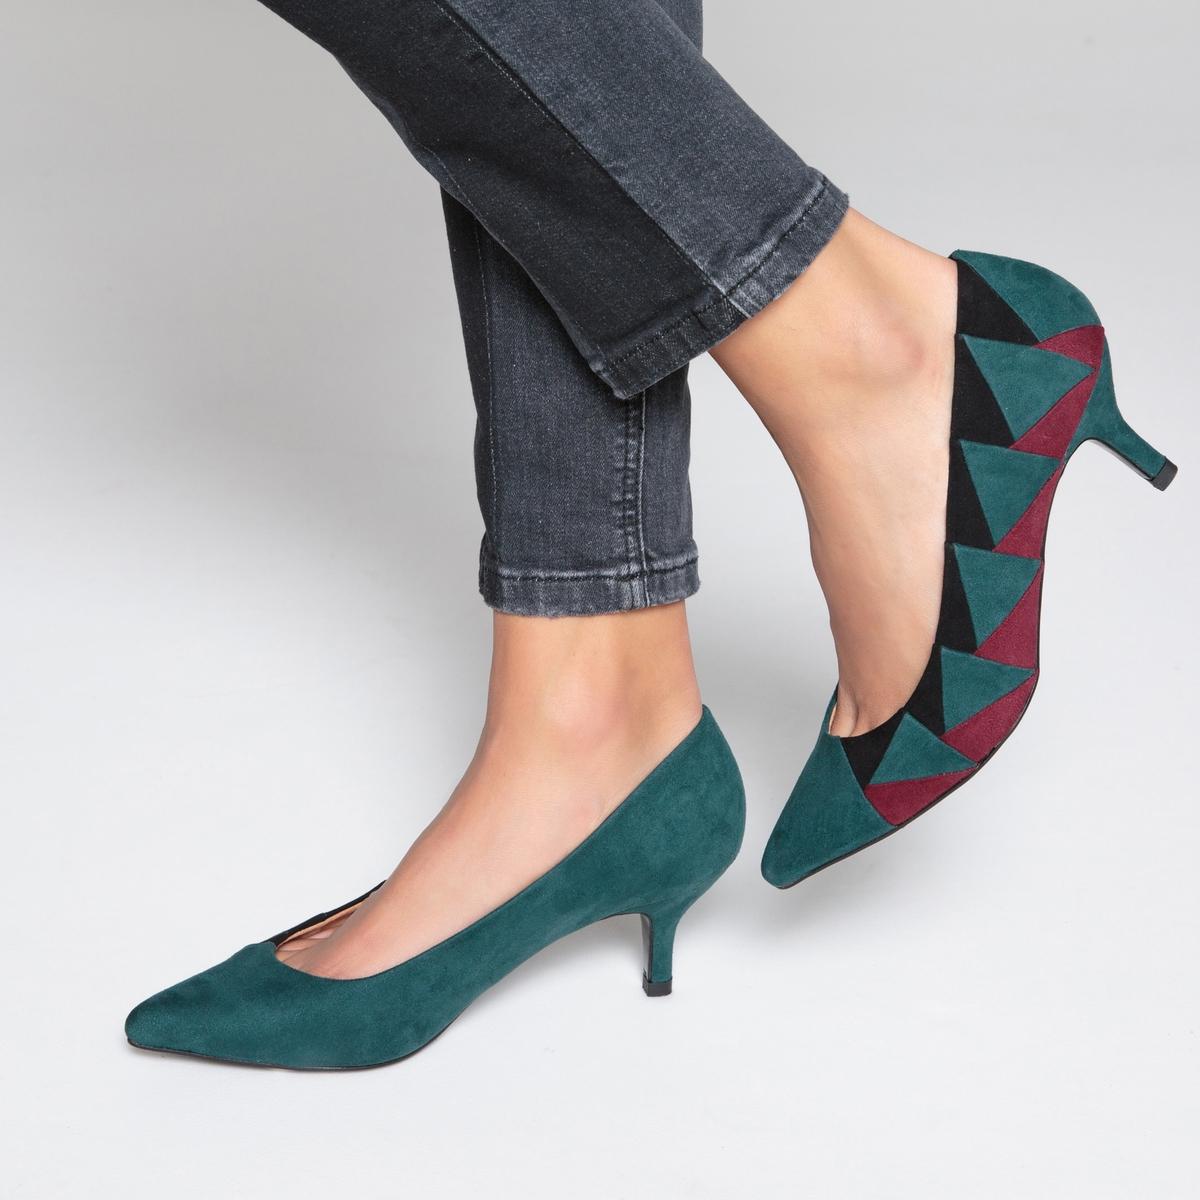 Туфли на каблуке с графичным рисунком туфли la strada туфли на каблуке